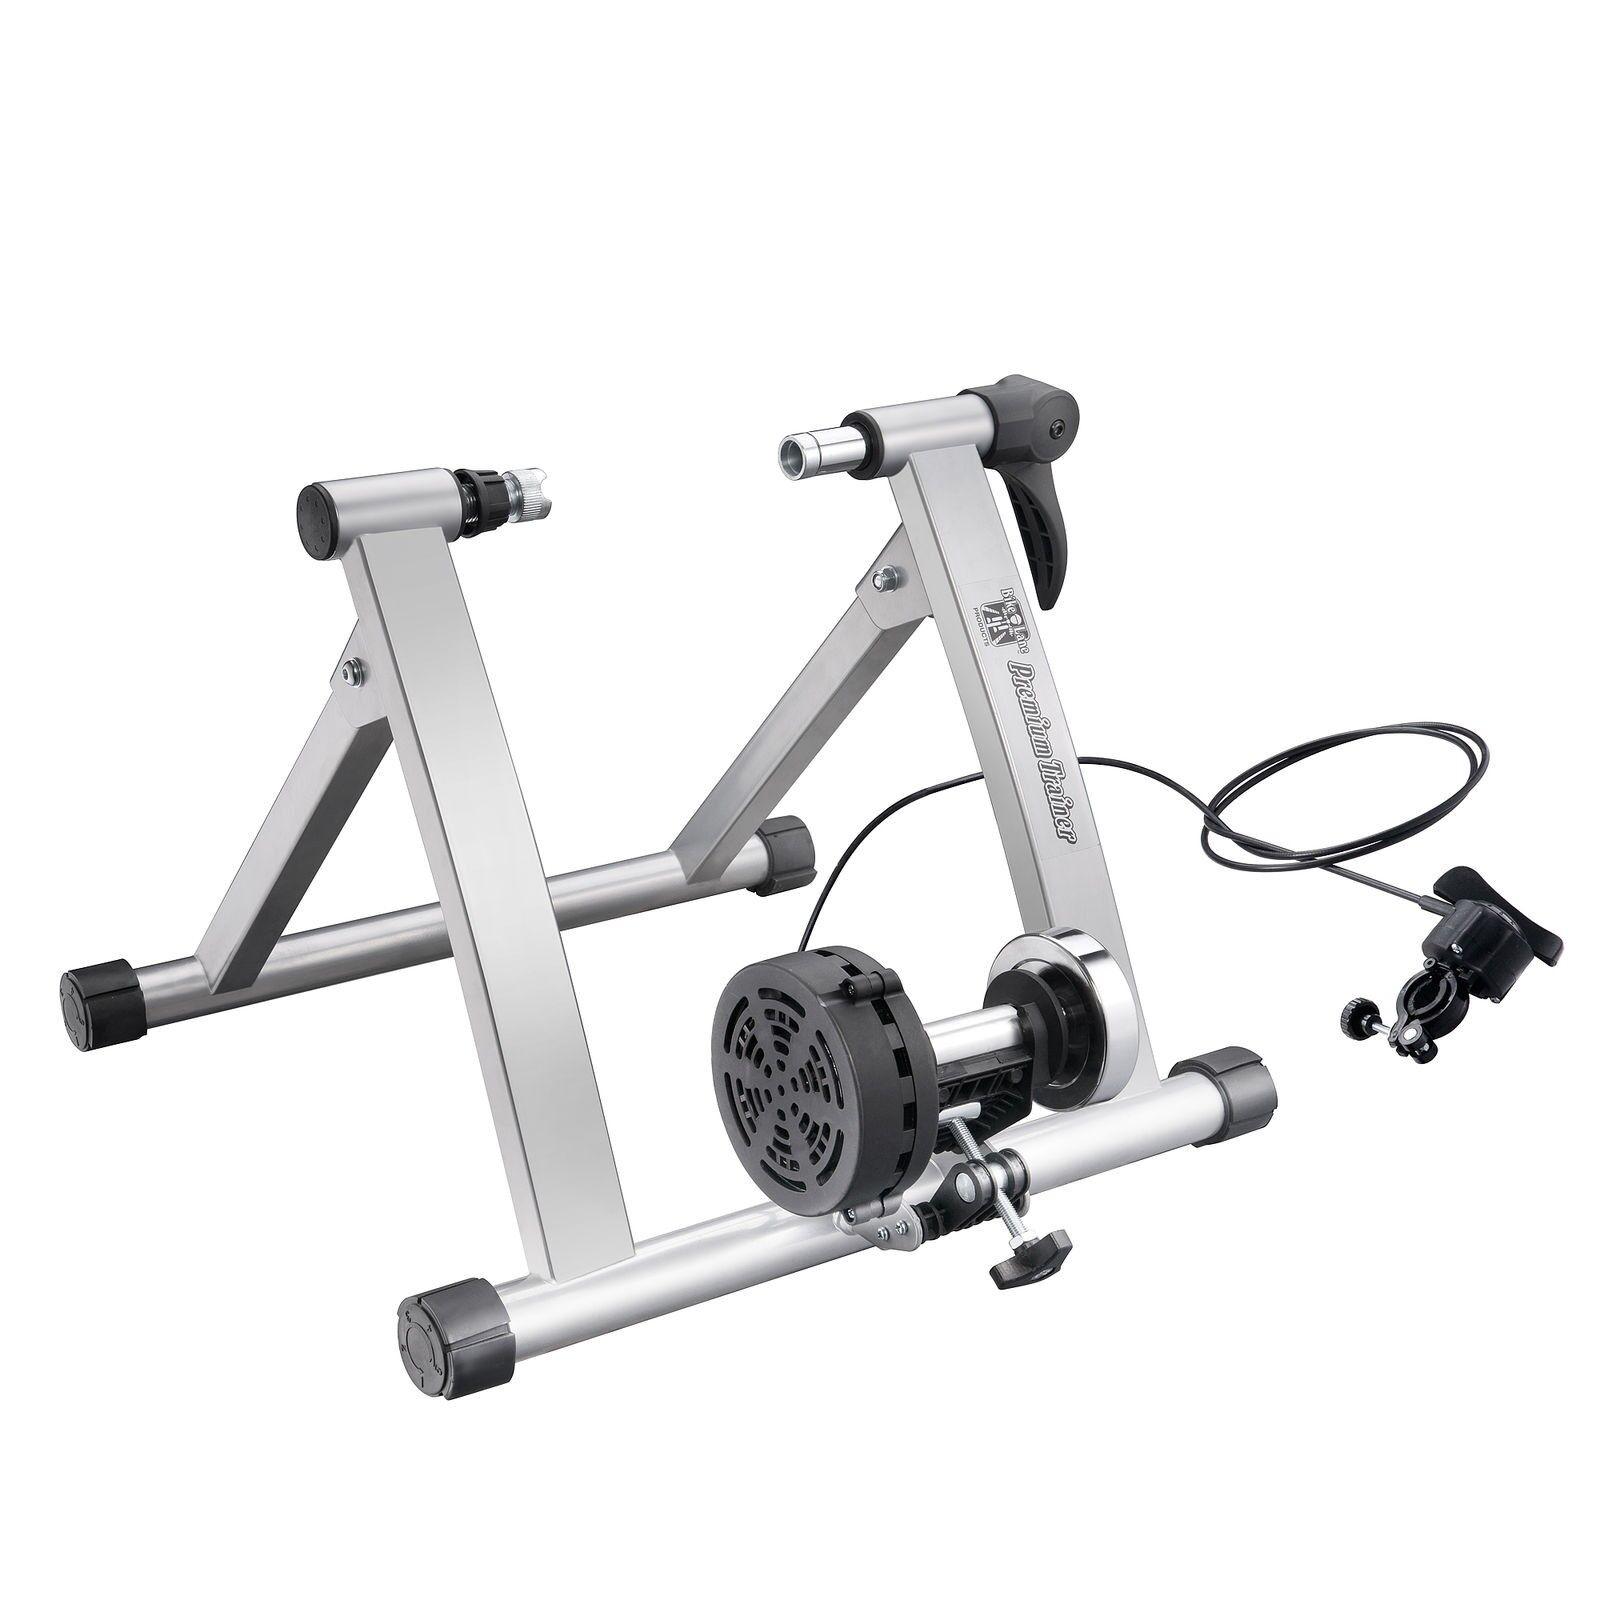 2015 Bike Lane Pro Trainer - Indoor Trainer Exercise Machine